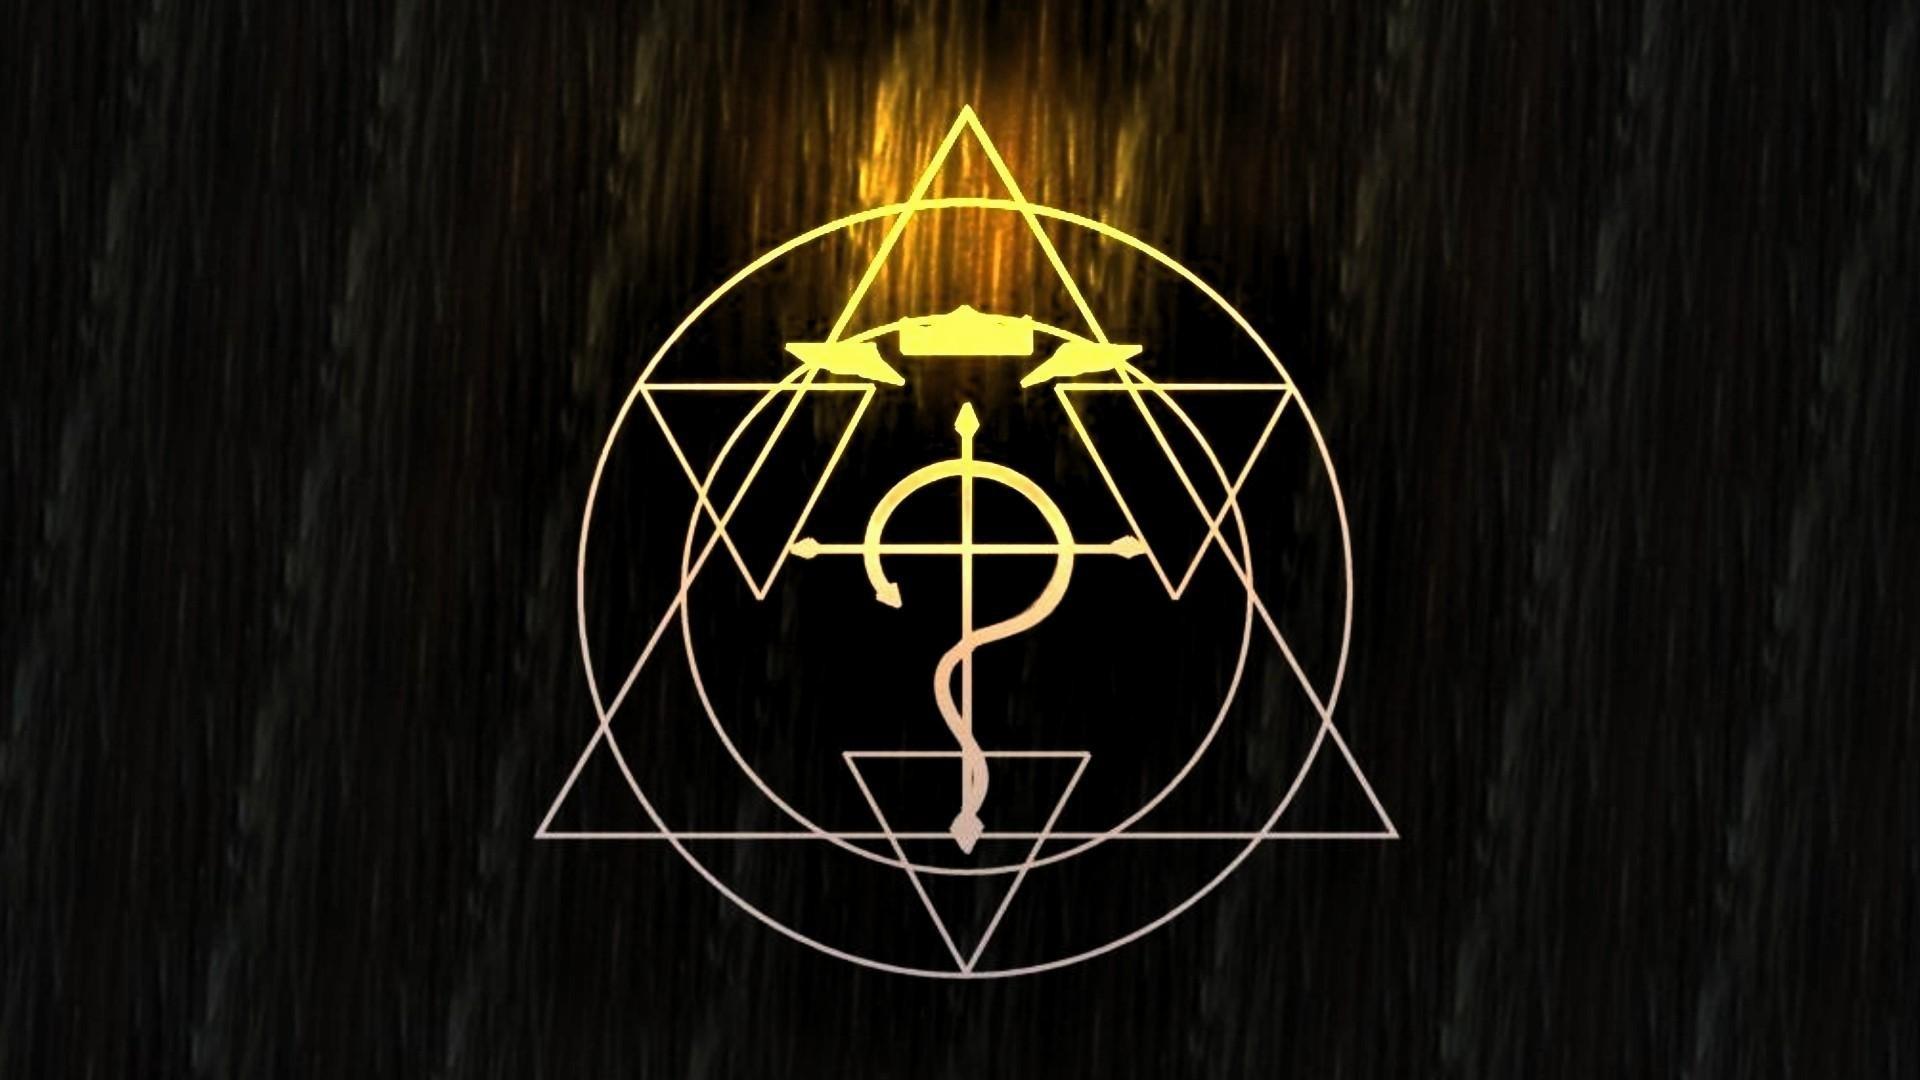 Beautiful Wallpaper Logo Fullmetal Alchemist - 159406  Collection_193264.jpg